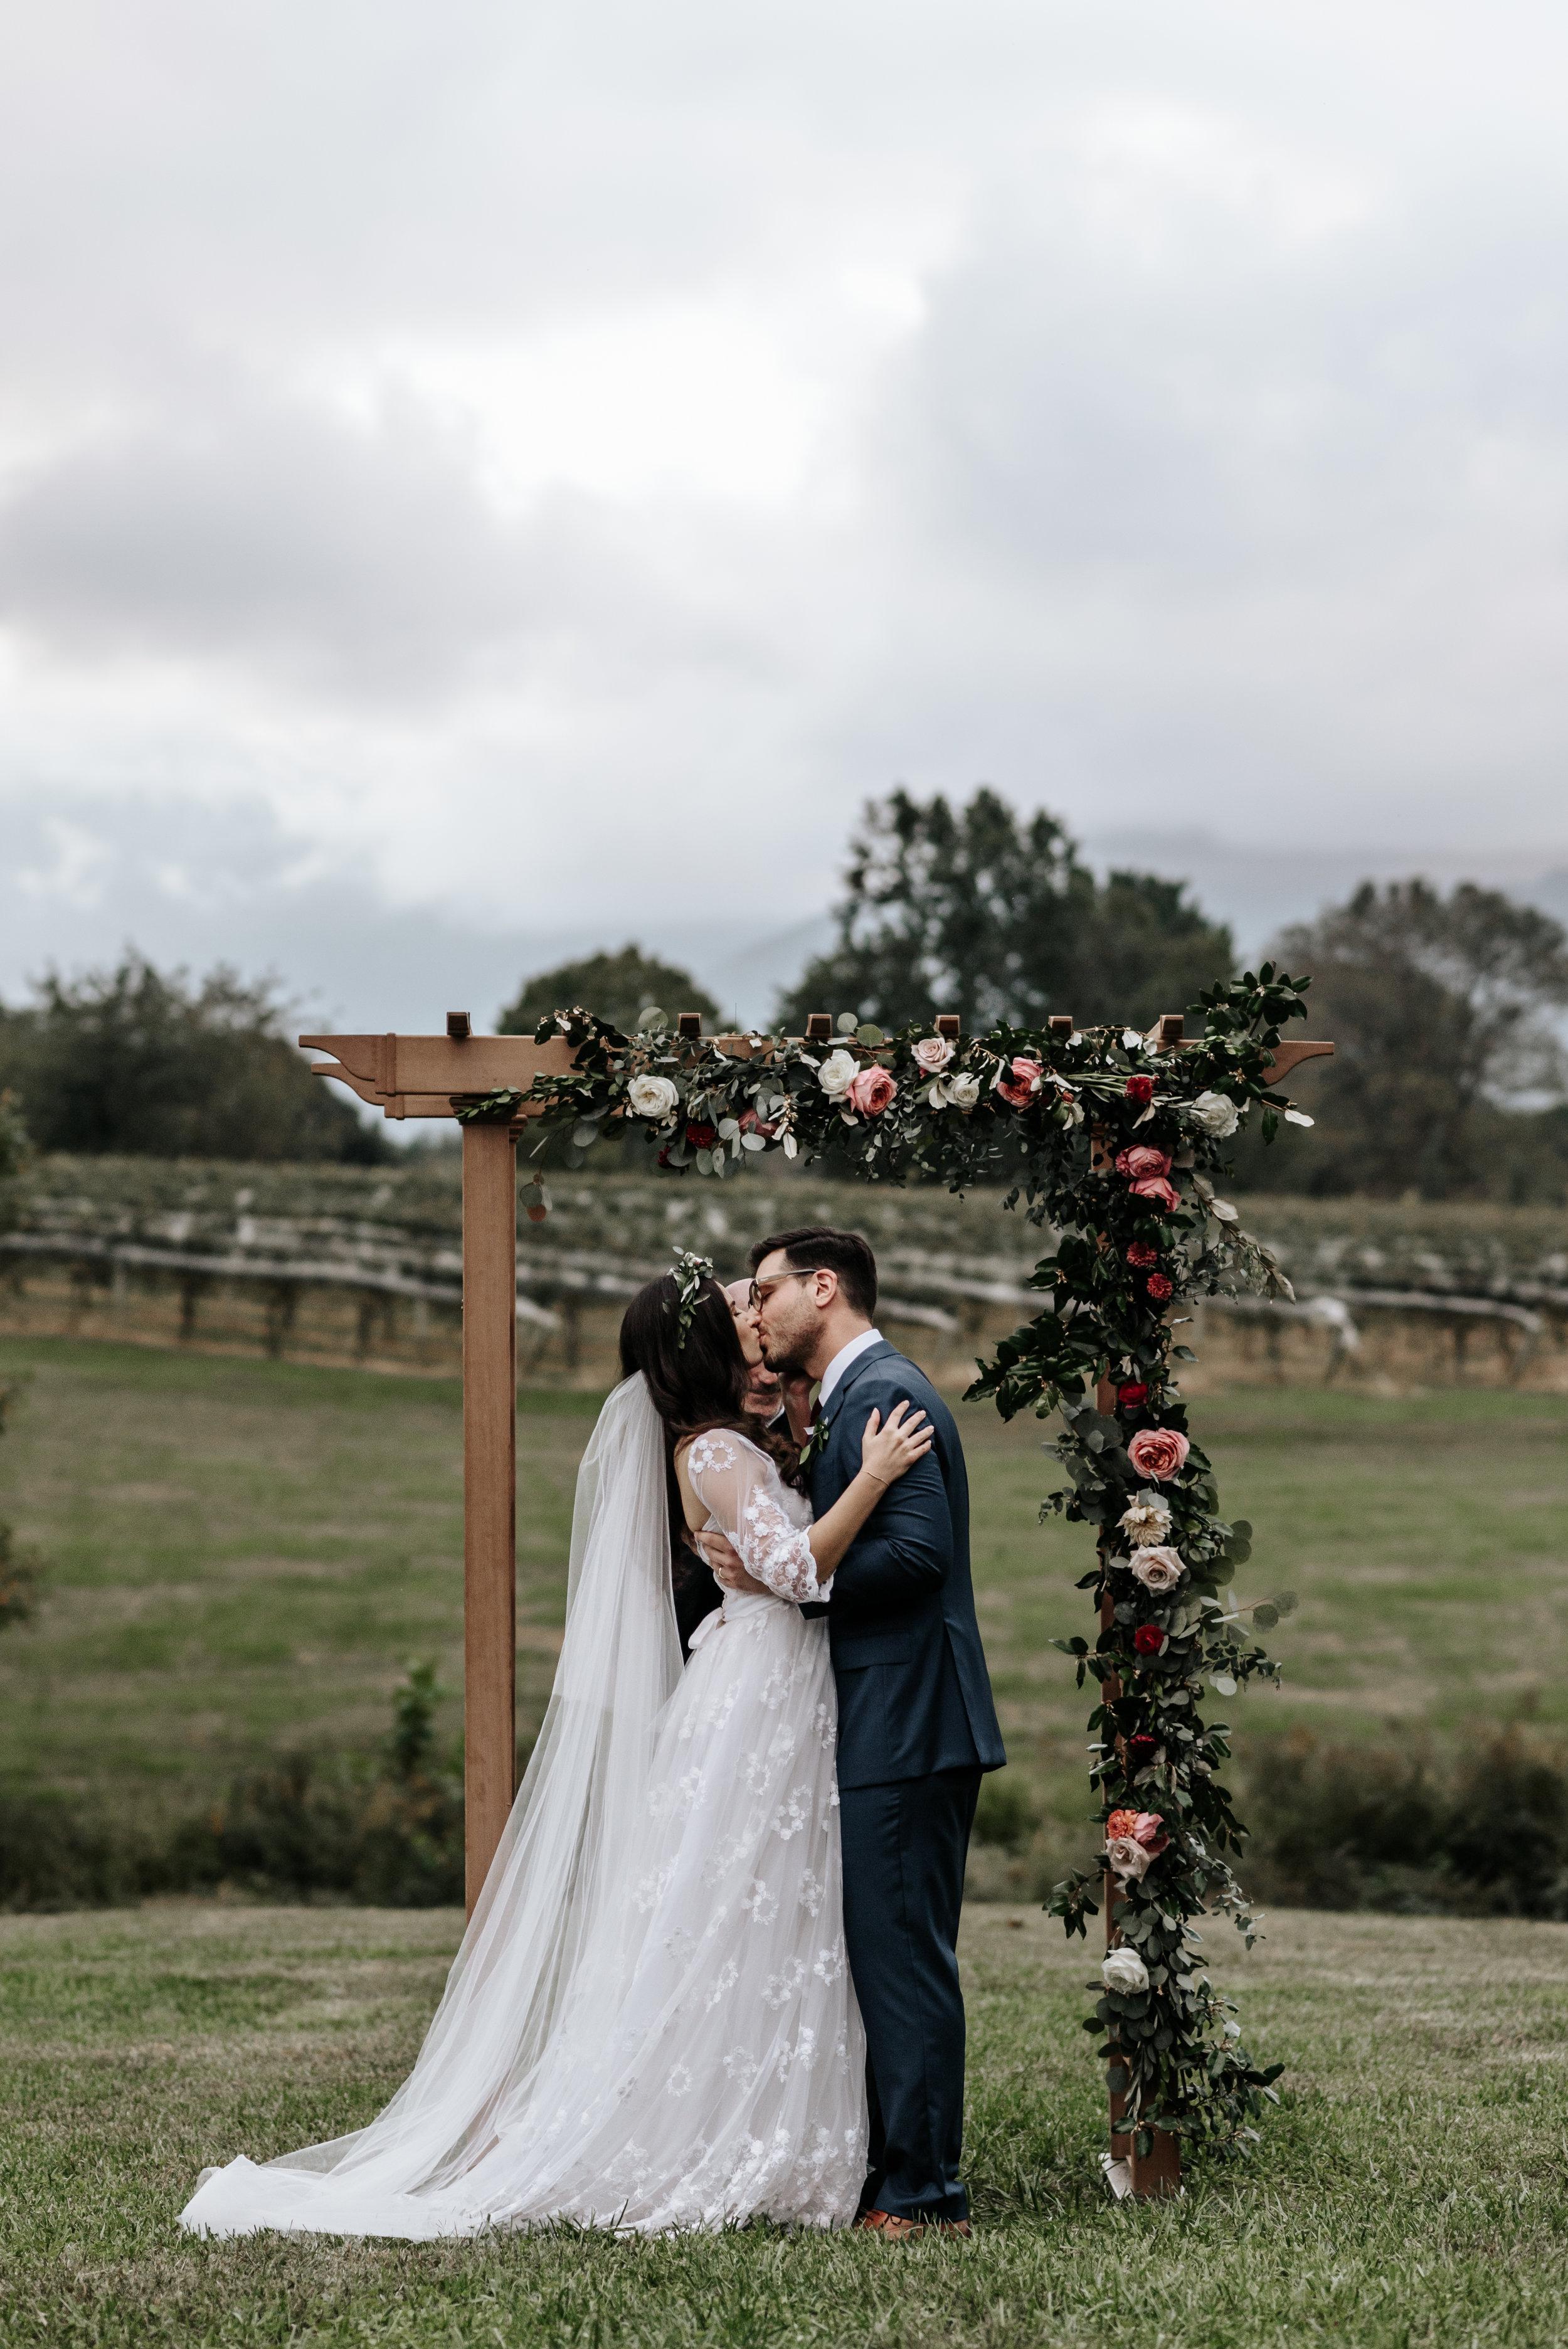 Veritas-Vineyards-and-Winery-Wedding-Photography-Afton-Virginia-Yasmin-Seth-Photography-by-V-2874.jpg